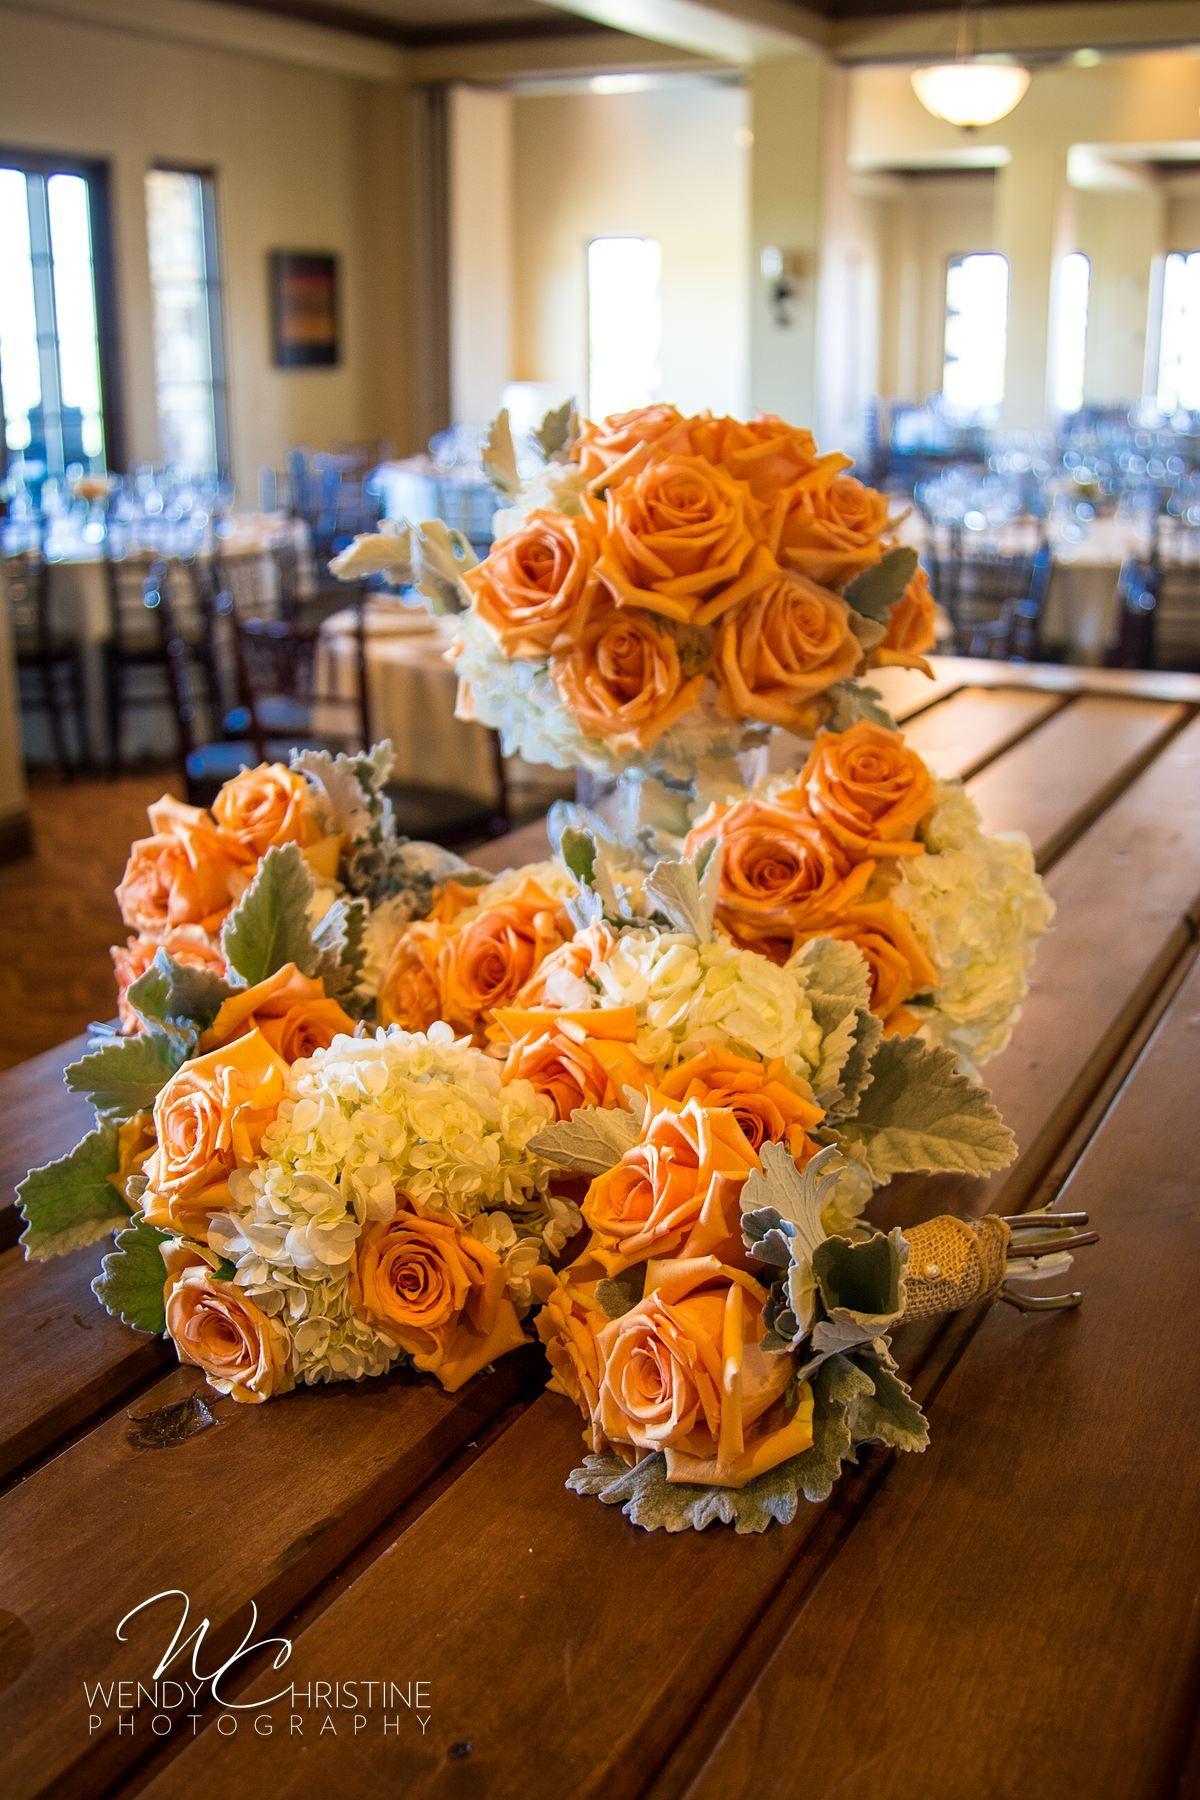 Heather & Zack's Wedding at Aliso VIejo Country Club #Peach #Bridal #Bouquet #OrangeCountyWedding #FarmTable #Peach&Teal #AlisoViejoCountryClub #WendyChristinePhotography